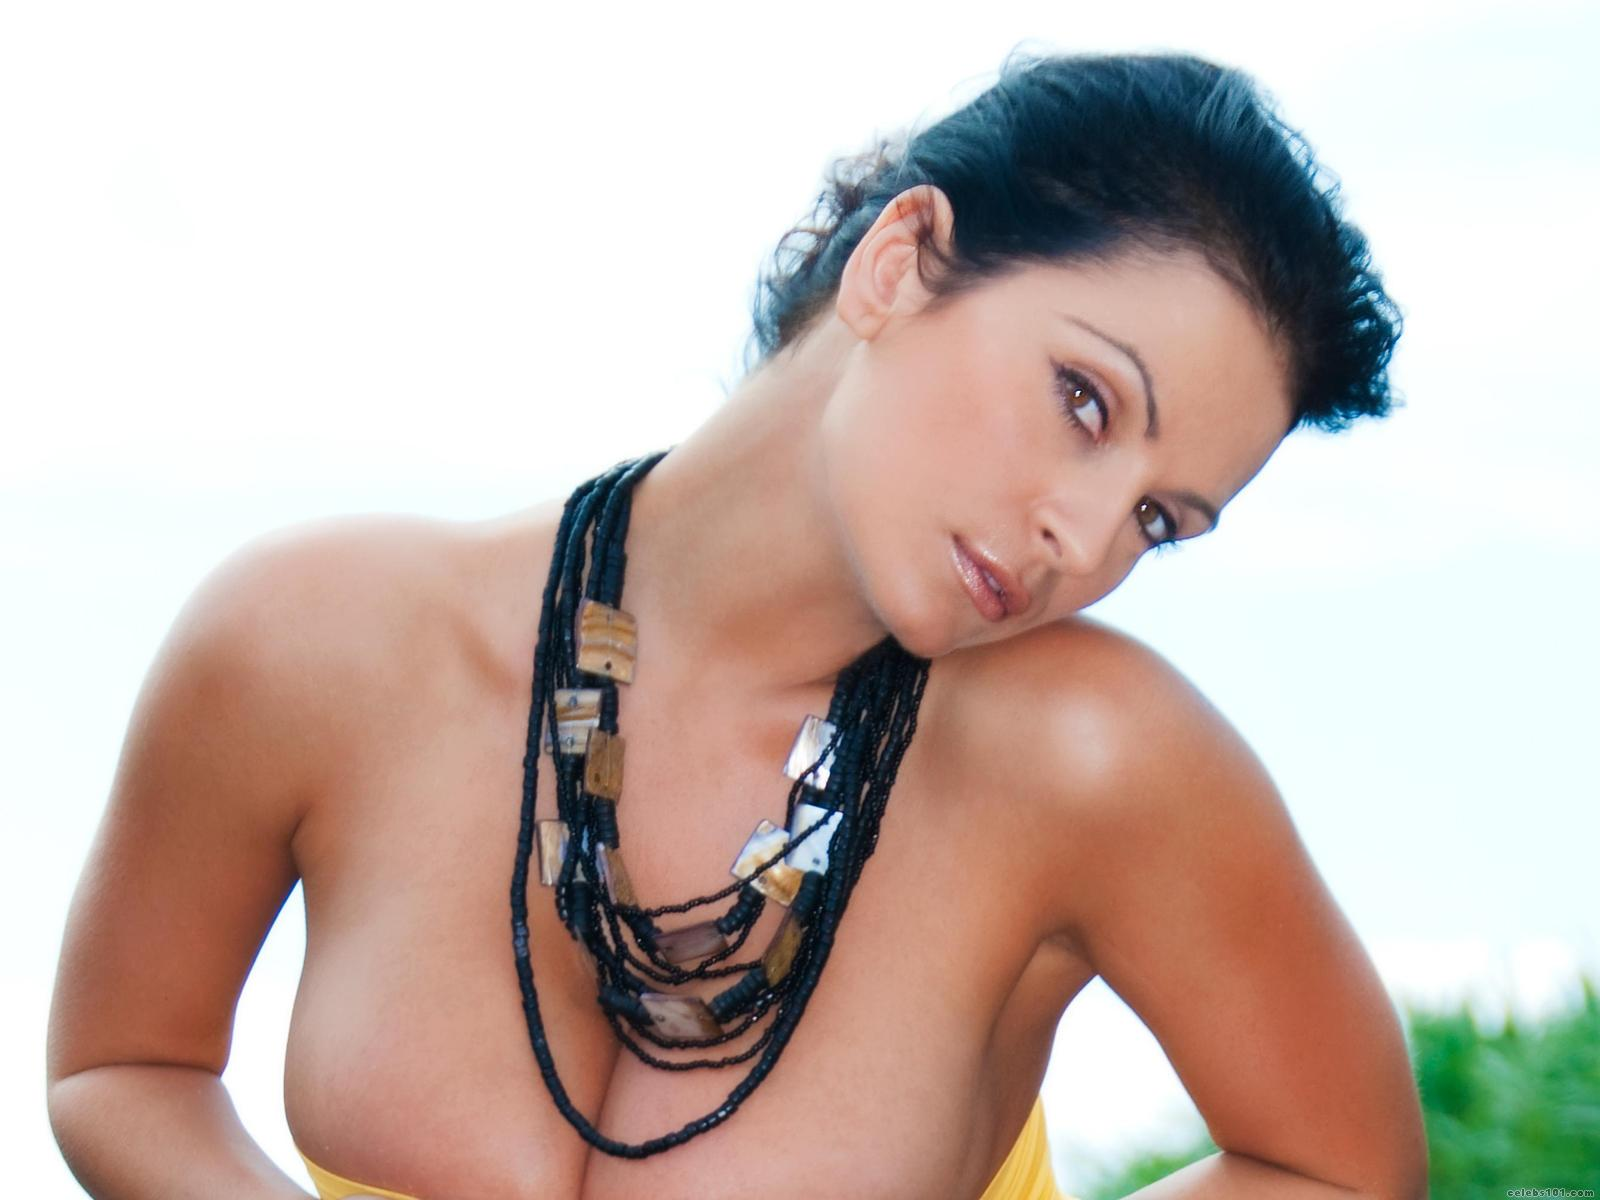 http://4.bp.blogspot.com/-h96Wq7-zSFA/TeRjCKfErfI/AAAAAAAAFFQ/EcZbxTvATUg/s1600/Denise+Milani190.jpg